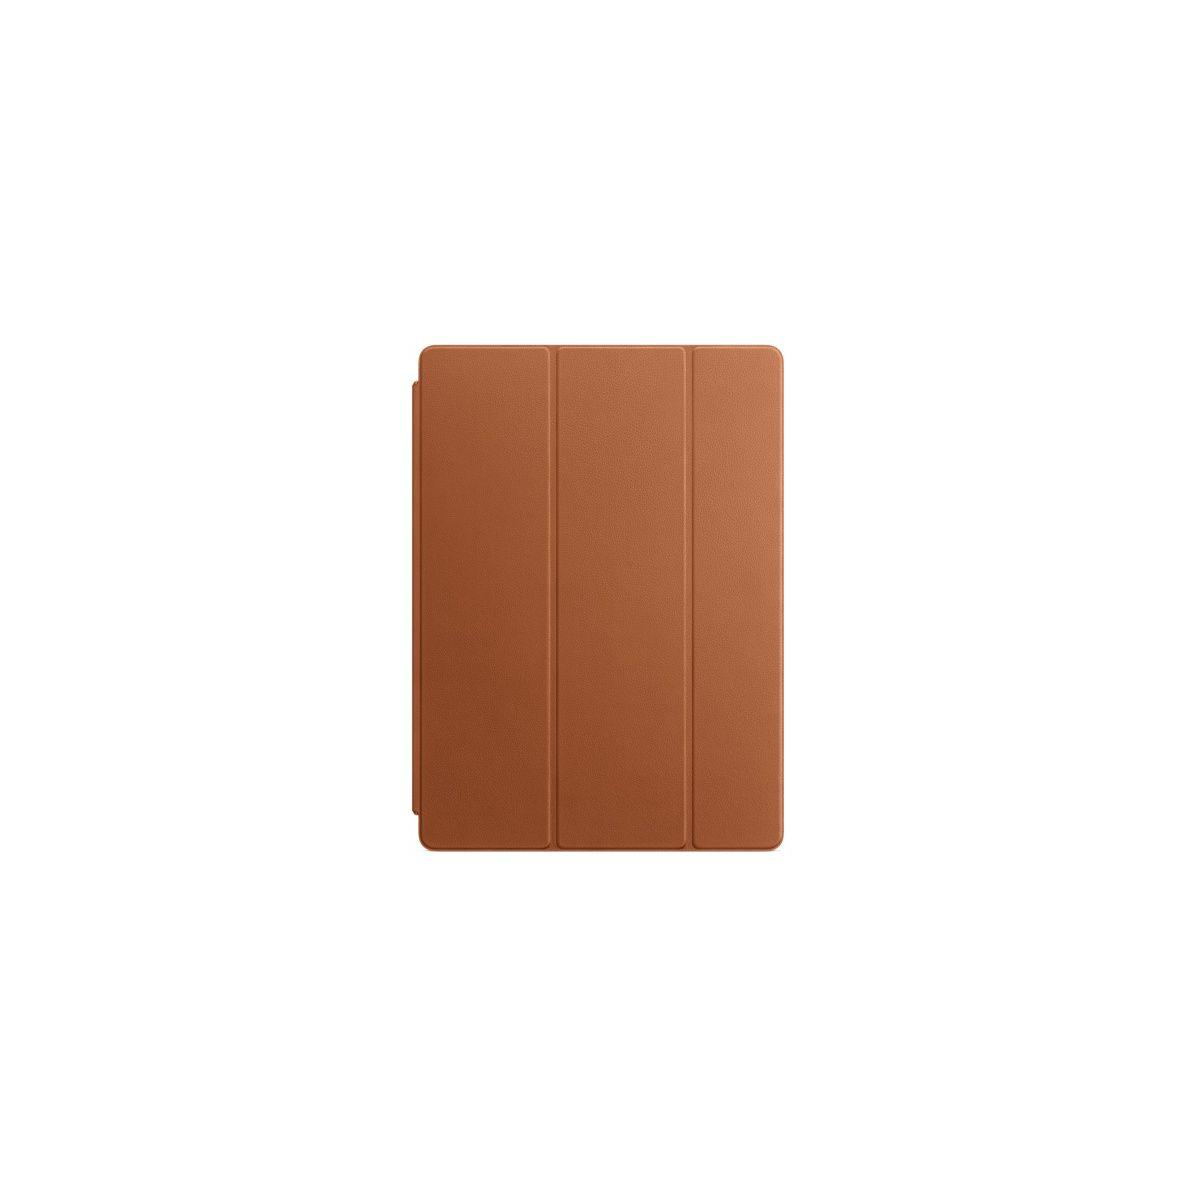 Etui tablette apple smart cover ipad pro 12.9 cuir havane - livraison offerte : code livdom (photo)